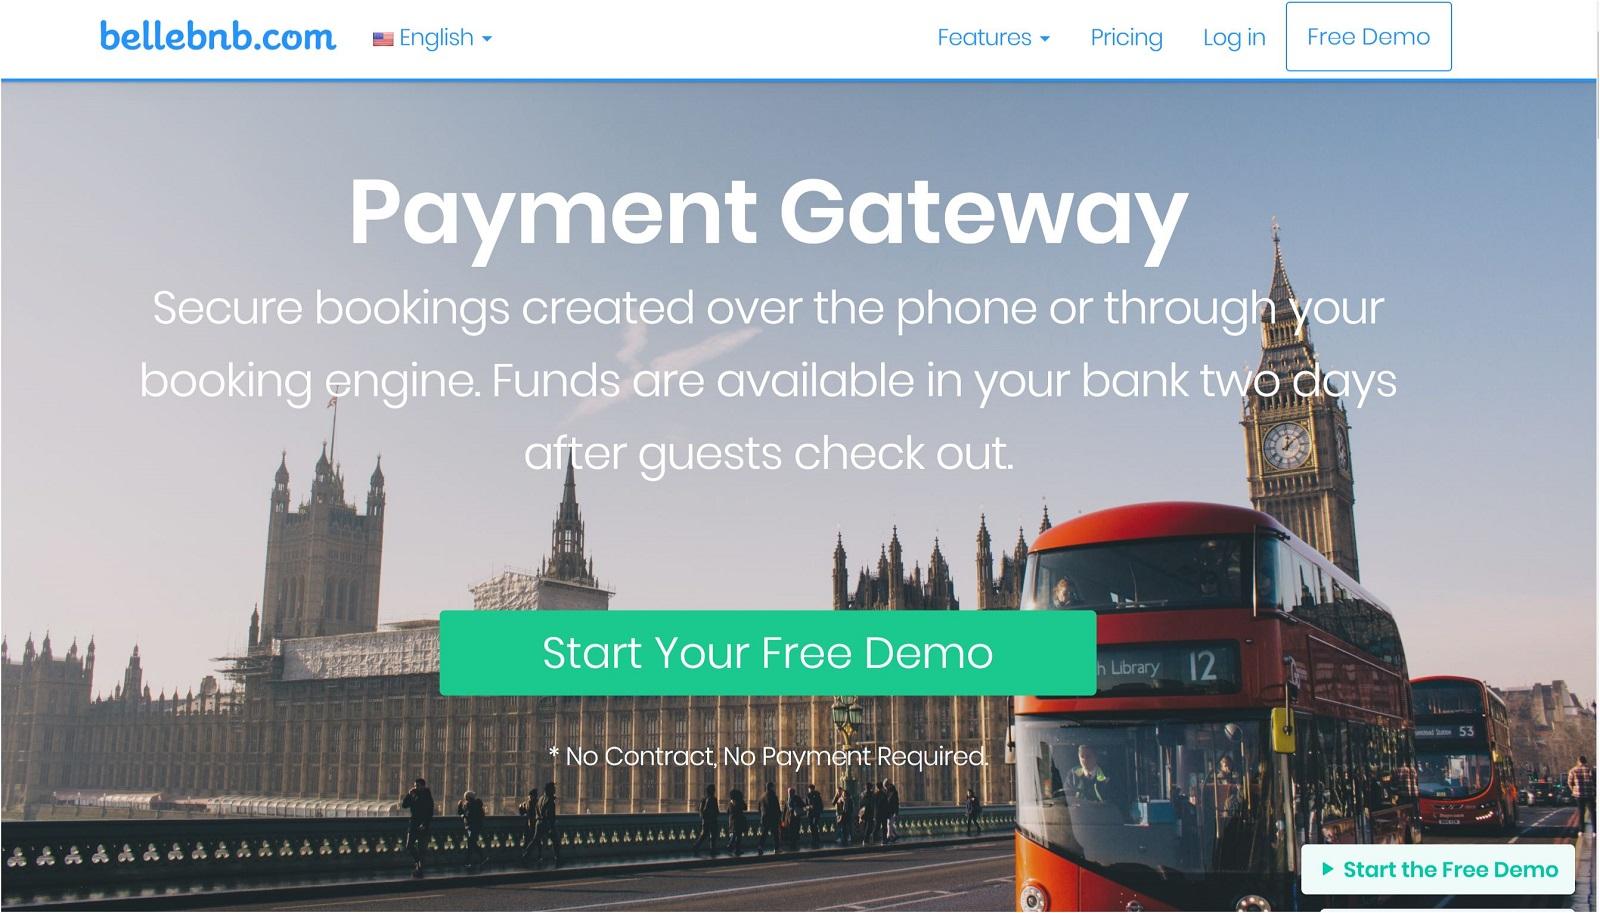 Bellebnb.com Hotel Payment Gateway